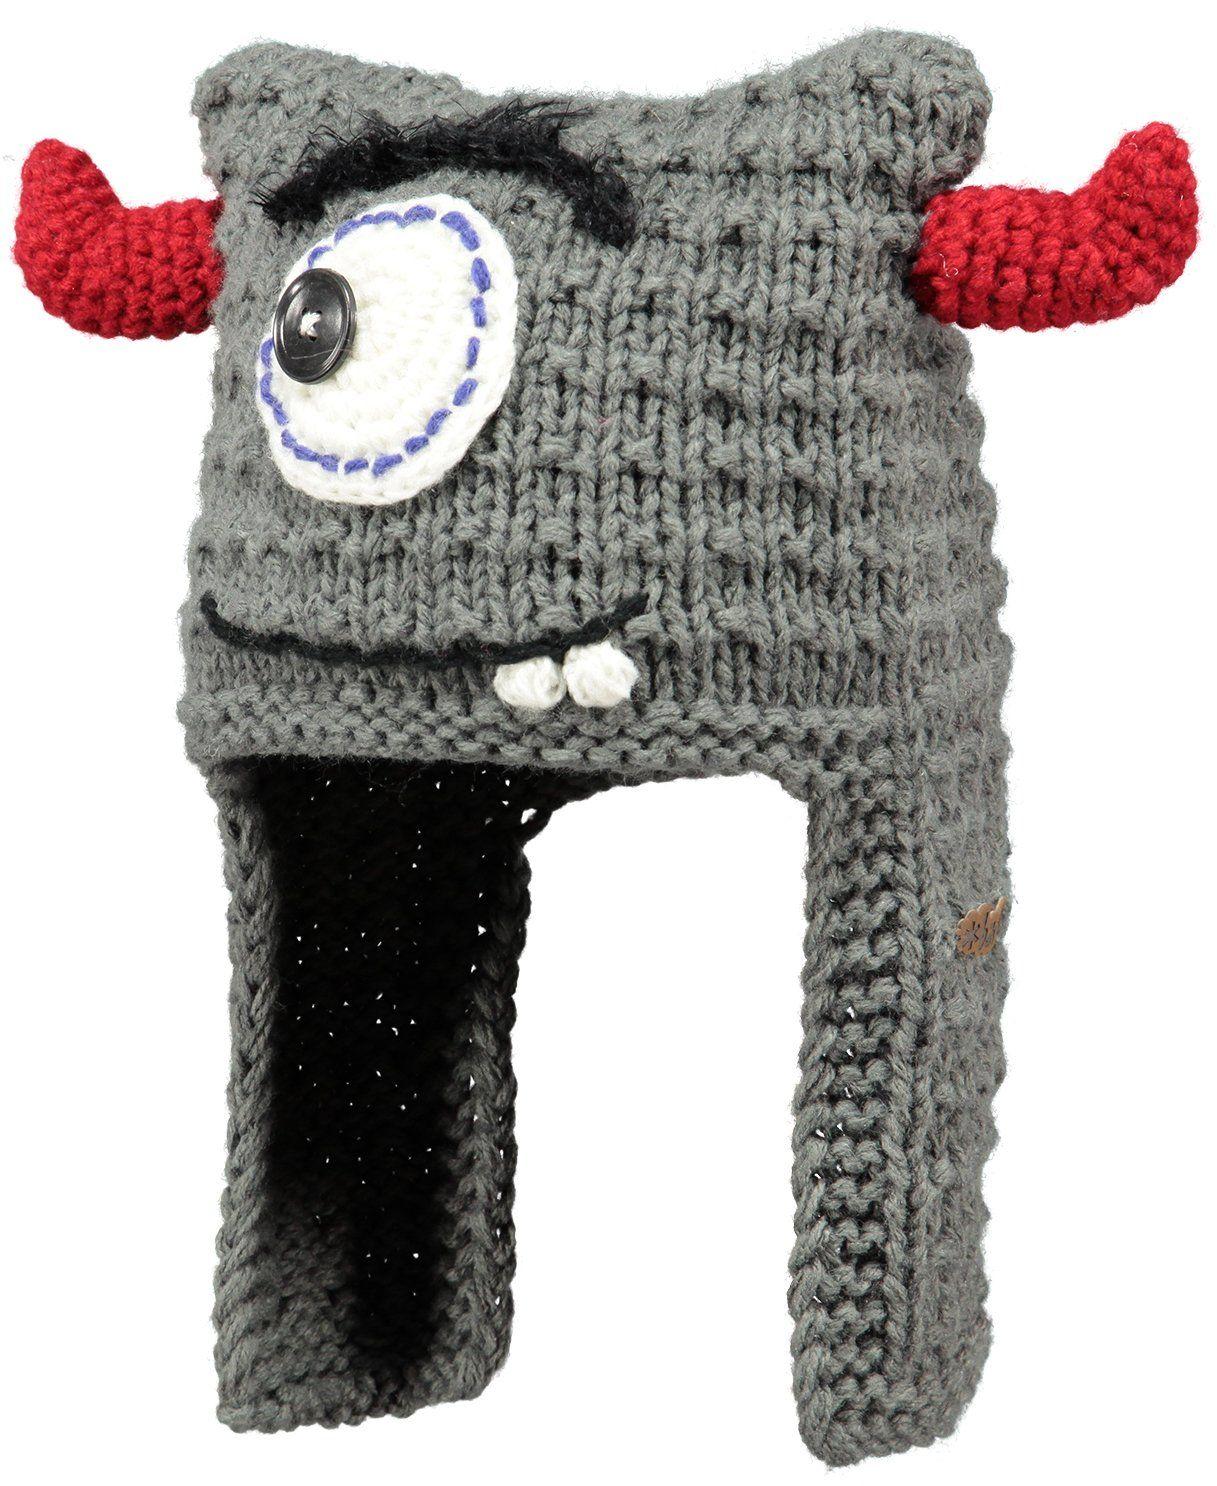 Barts Handgefertigte Kinder Strickmütze Brody Inka 2312, Kopfumfang:50: Amazon.de: Bekleidung